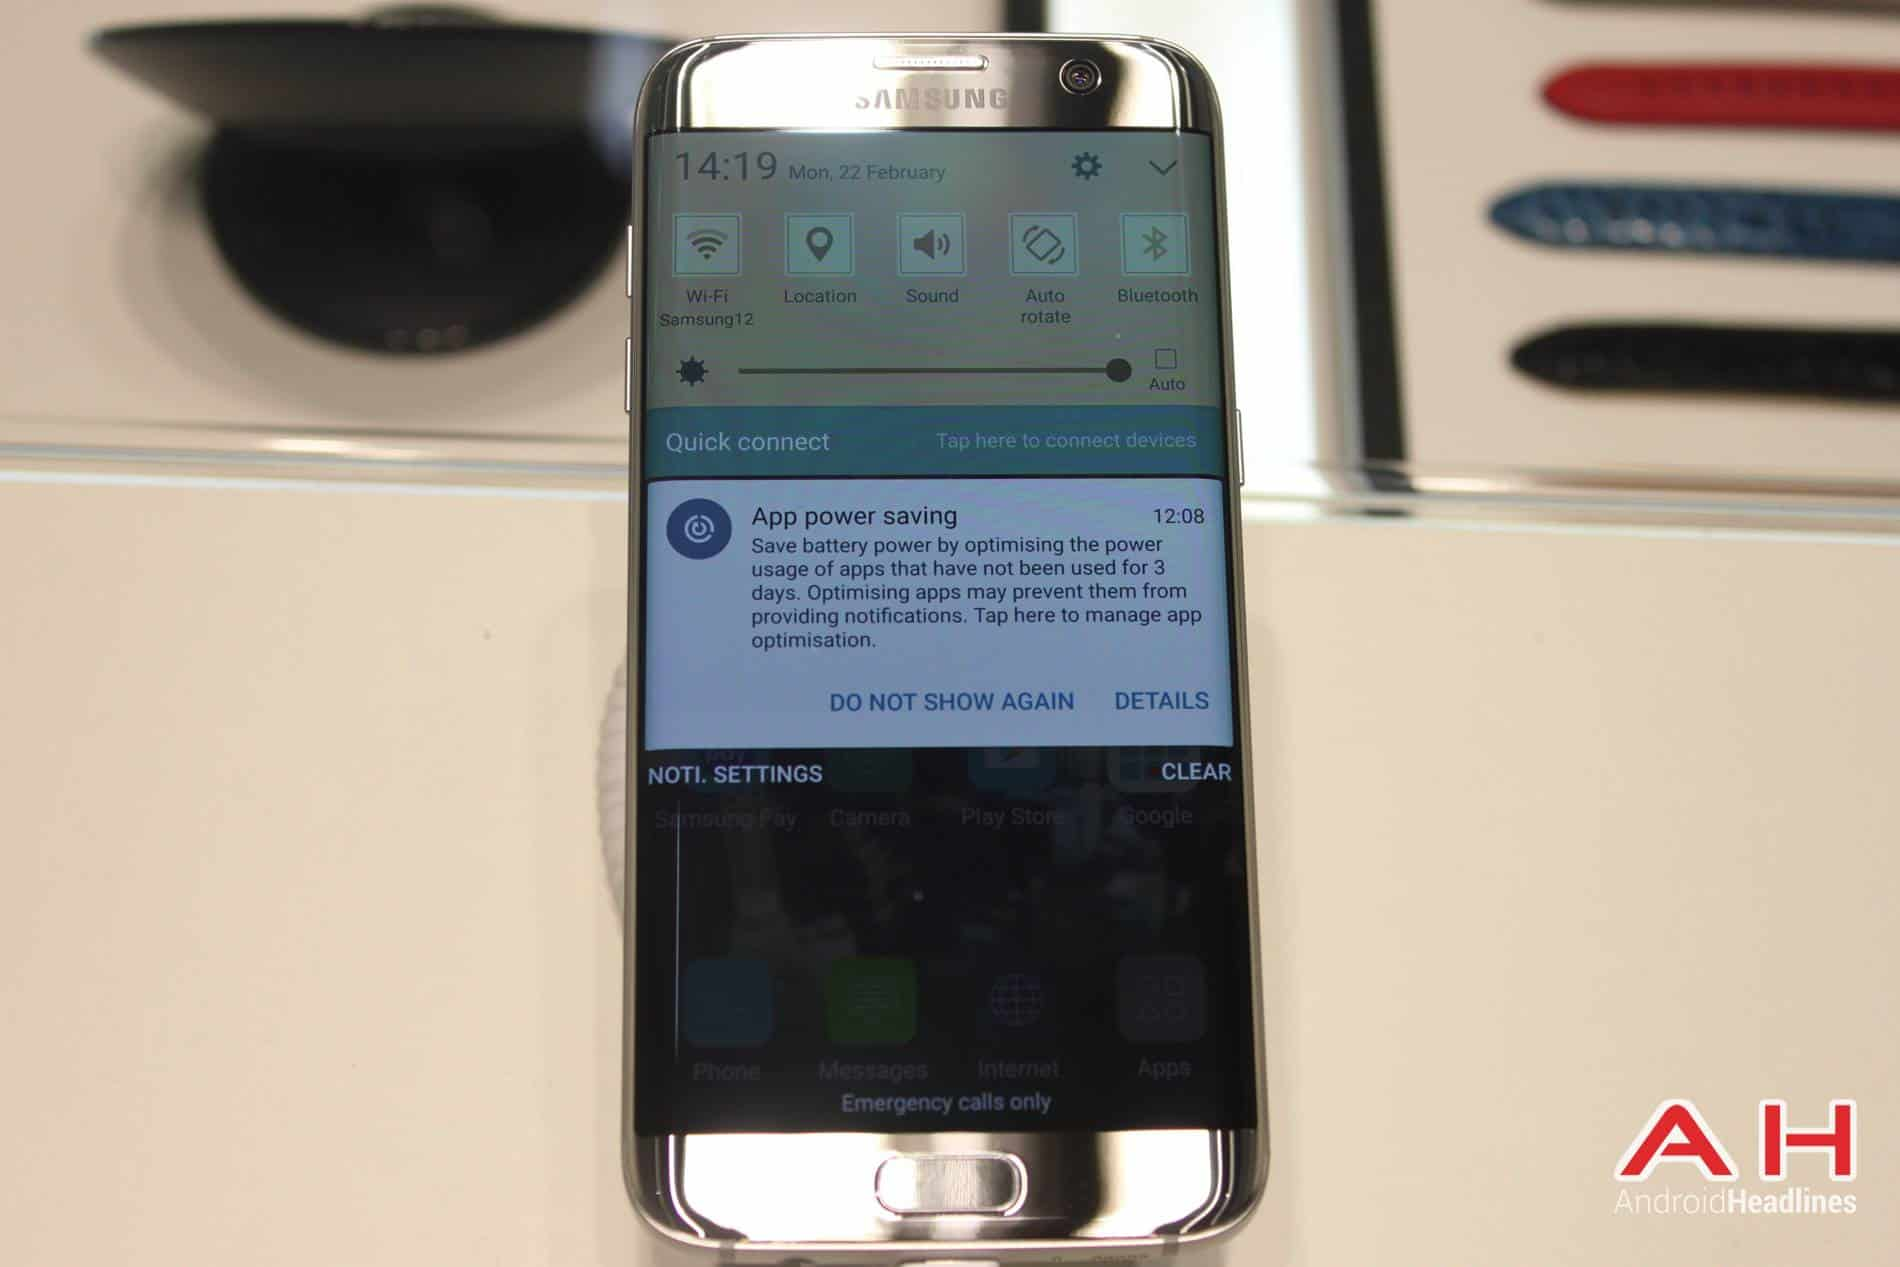 Galaxy S7 Edge MWC Booth AH 1